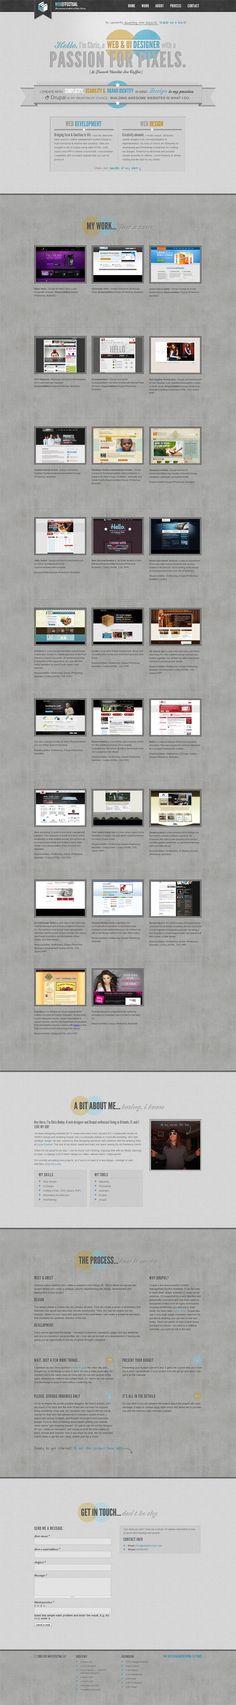 Web Effectual | Web Design